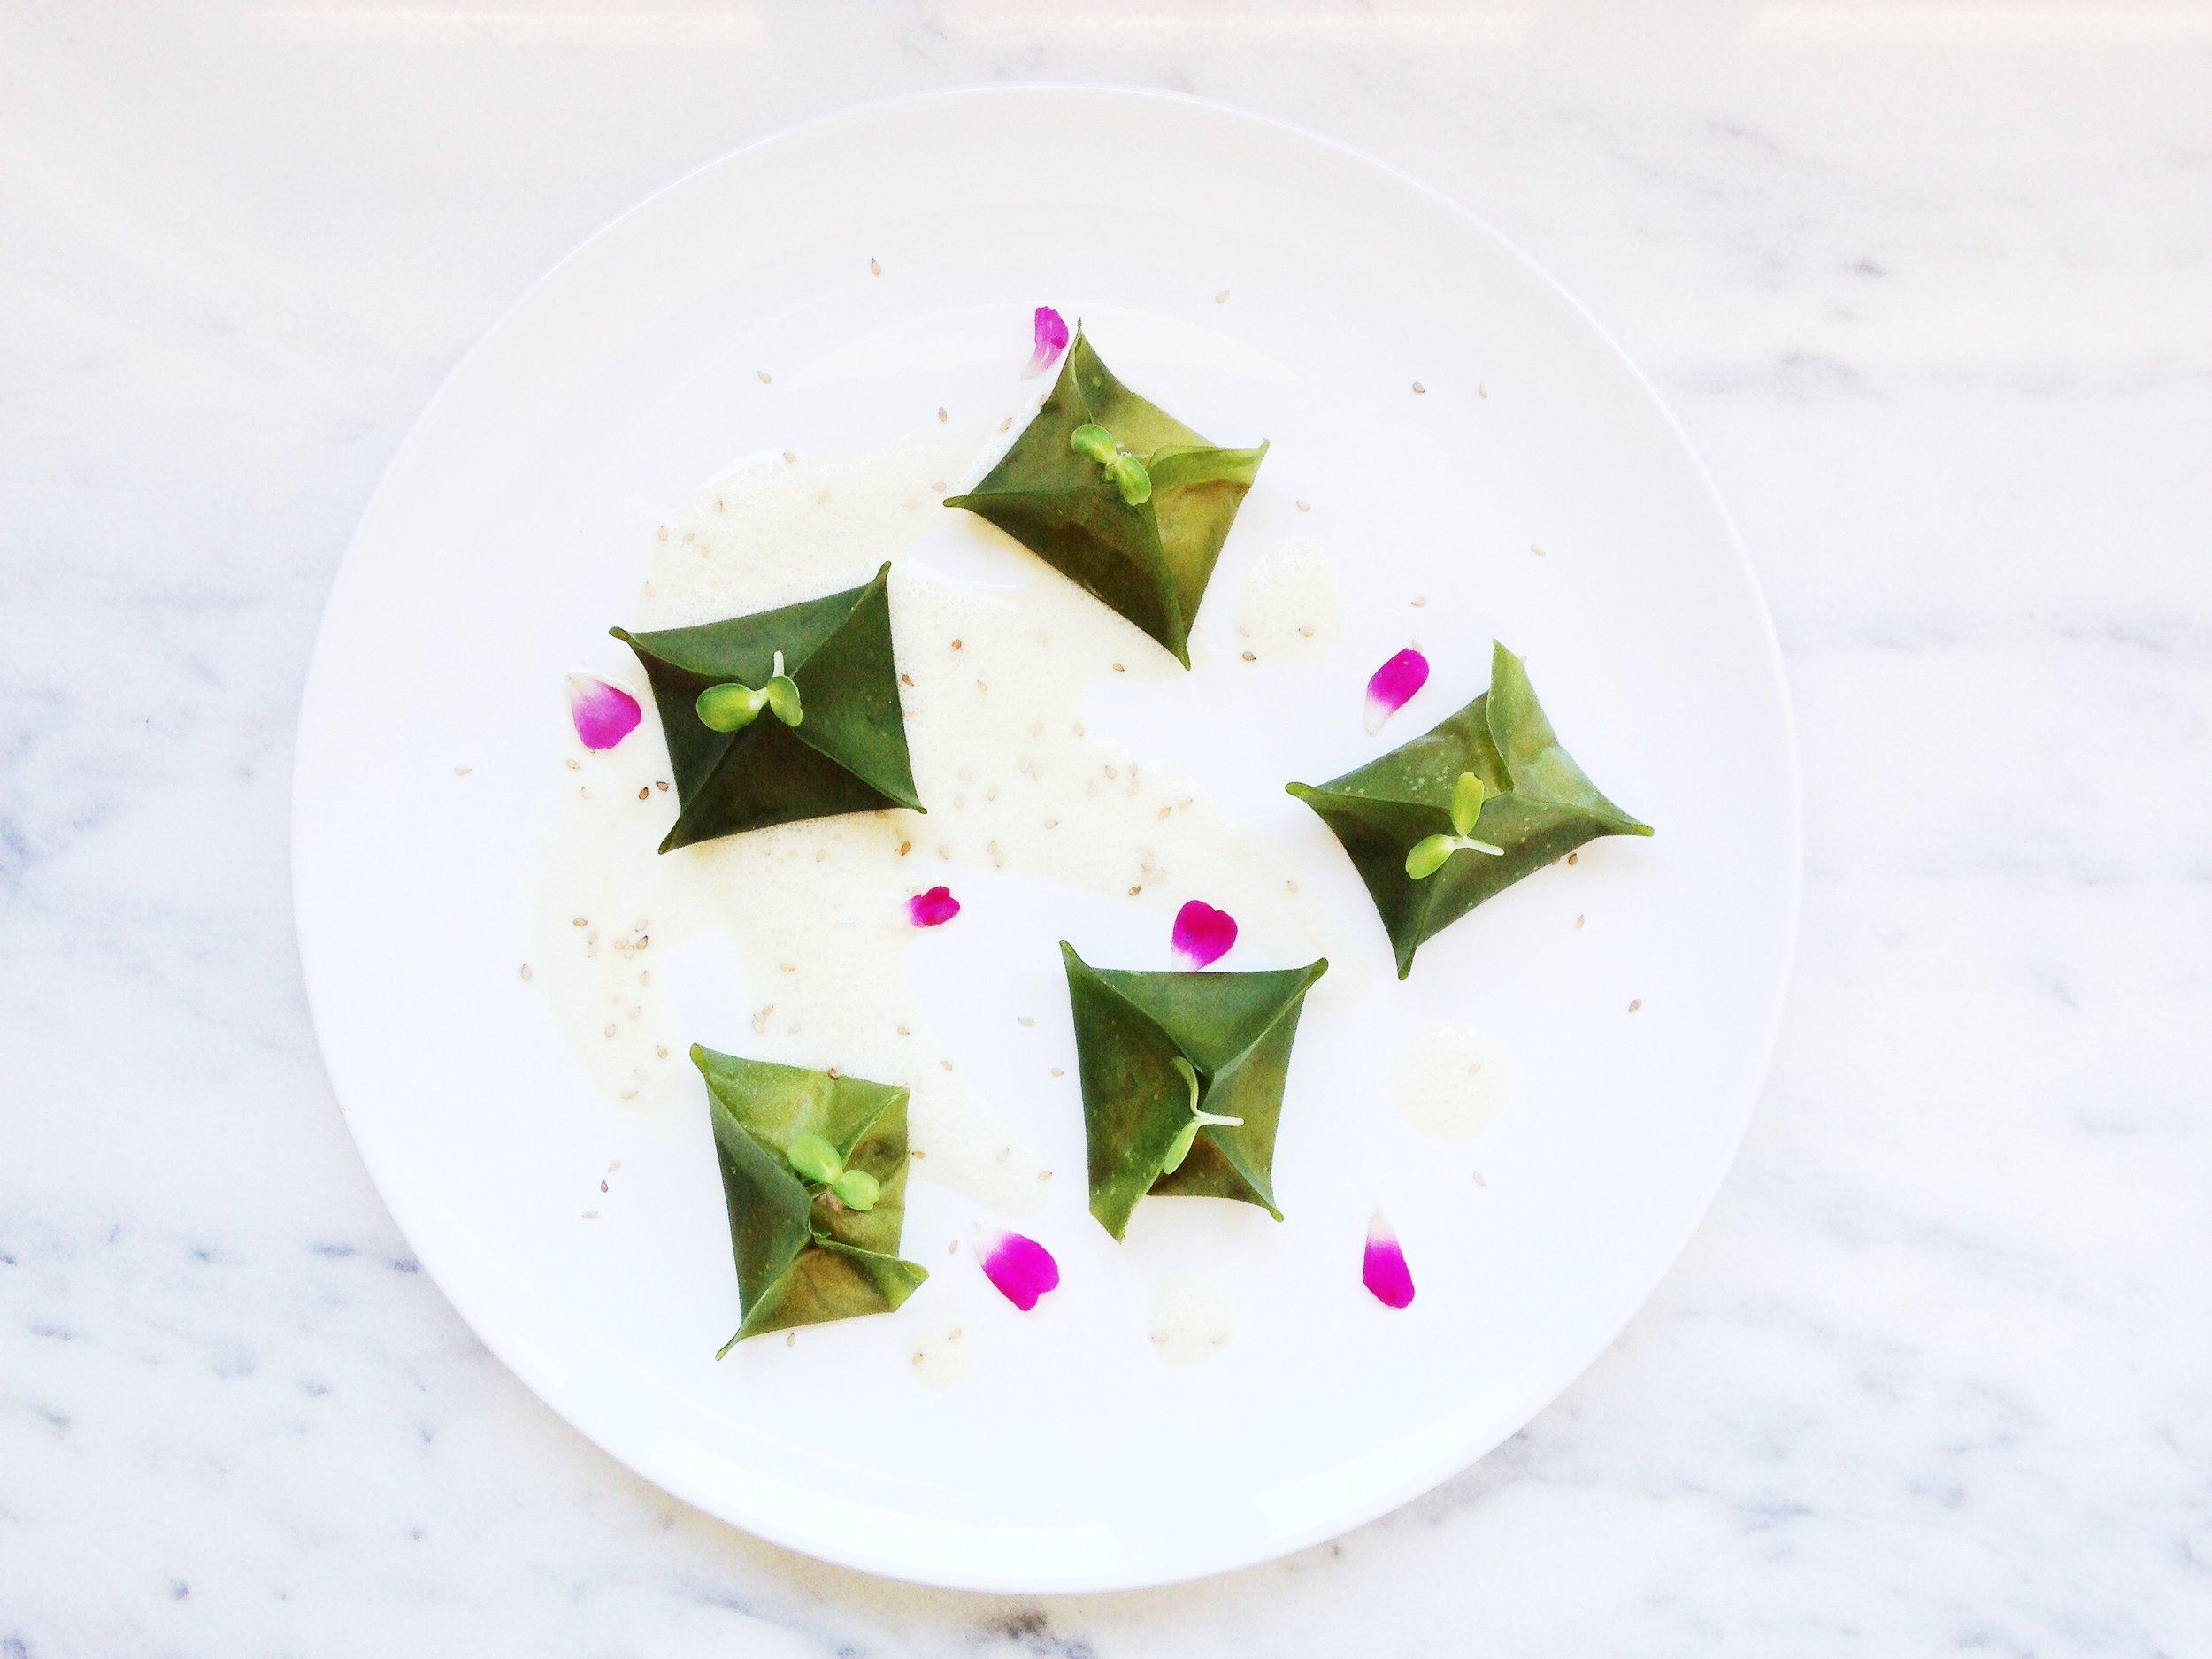 MKC_Raw I_Kimchi dumplings.JPG